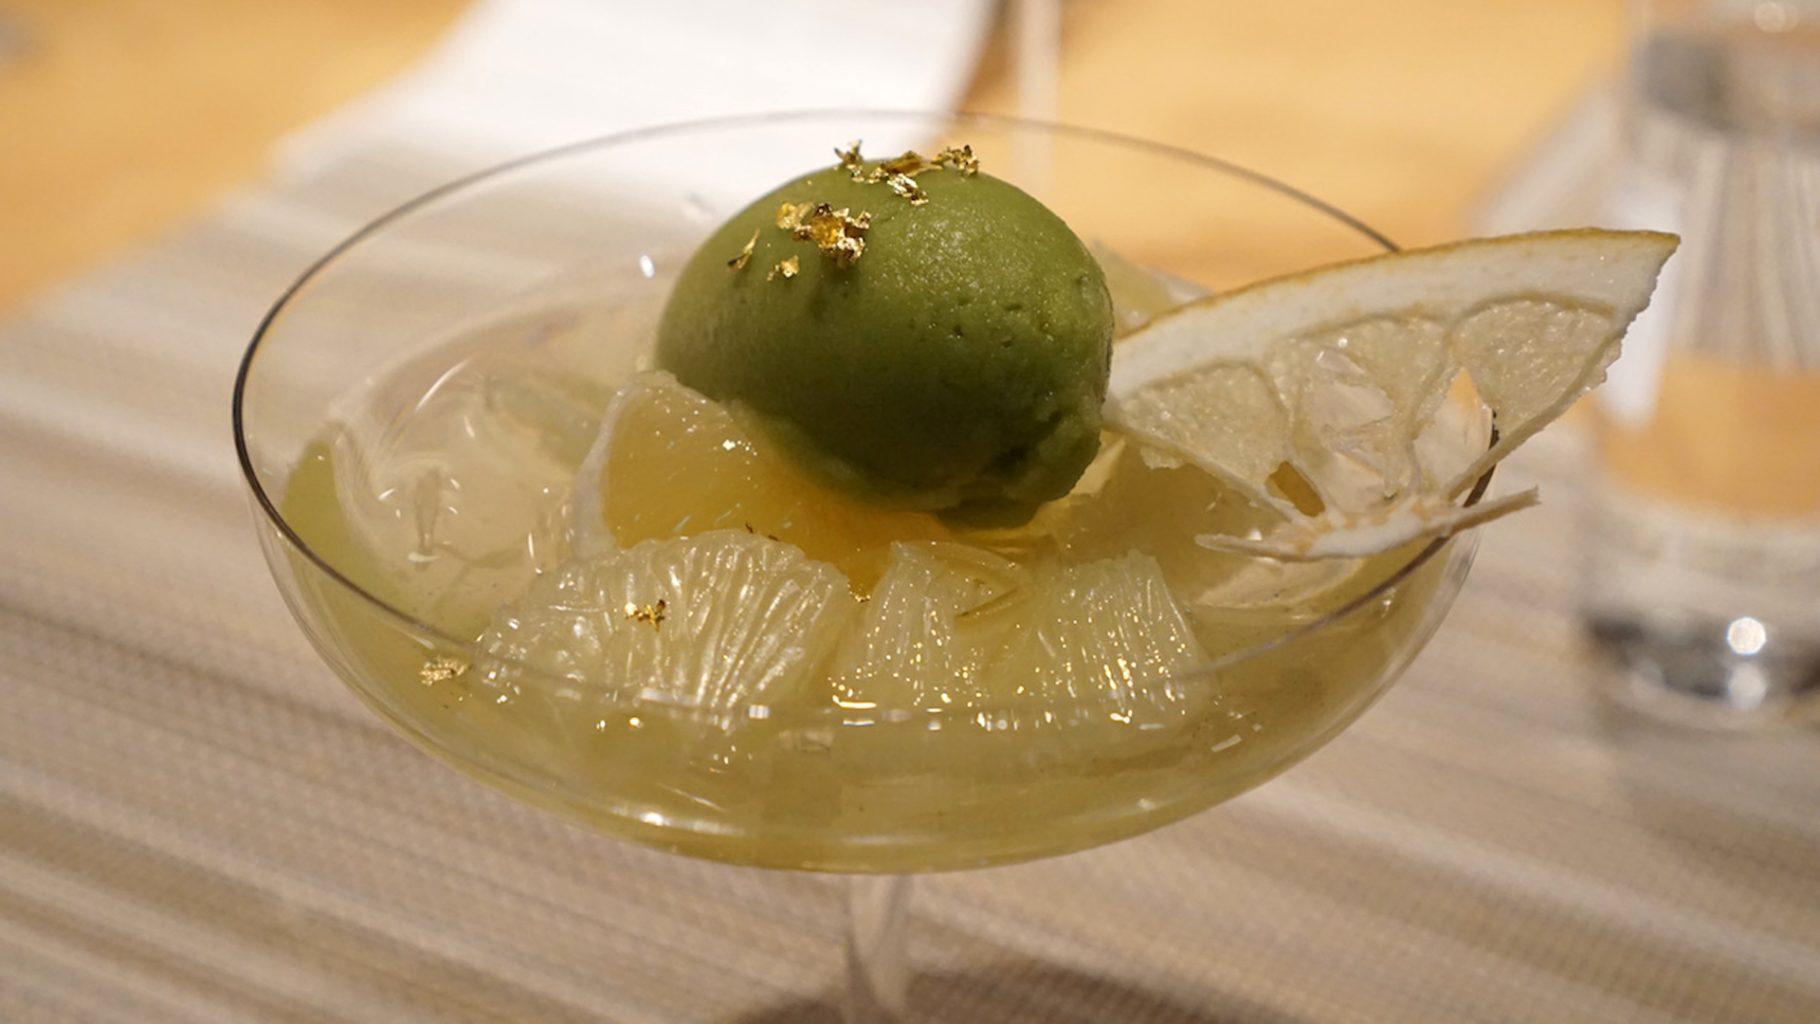 Sugalabo, pomelo Buntan con gelato al basilico